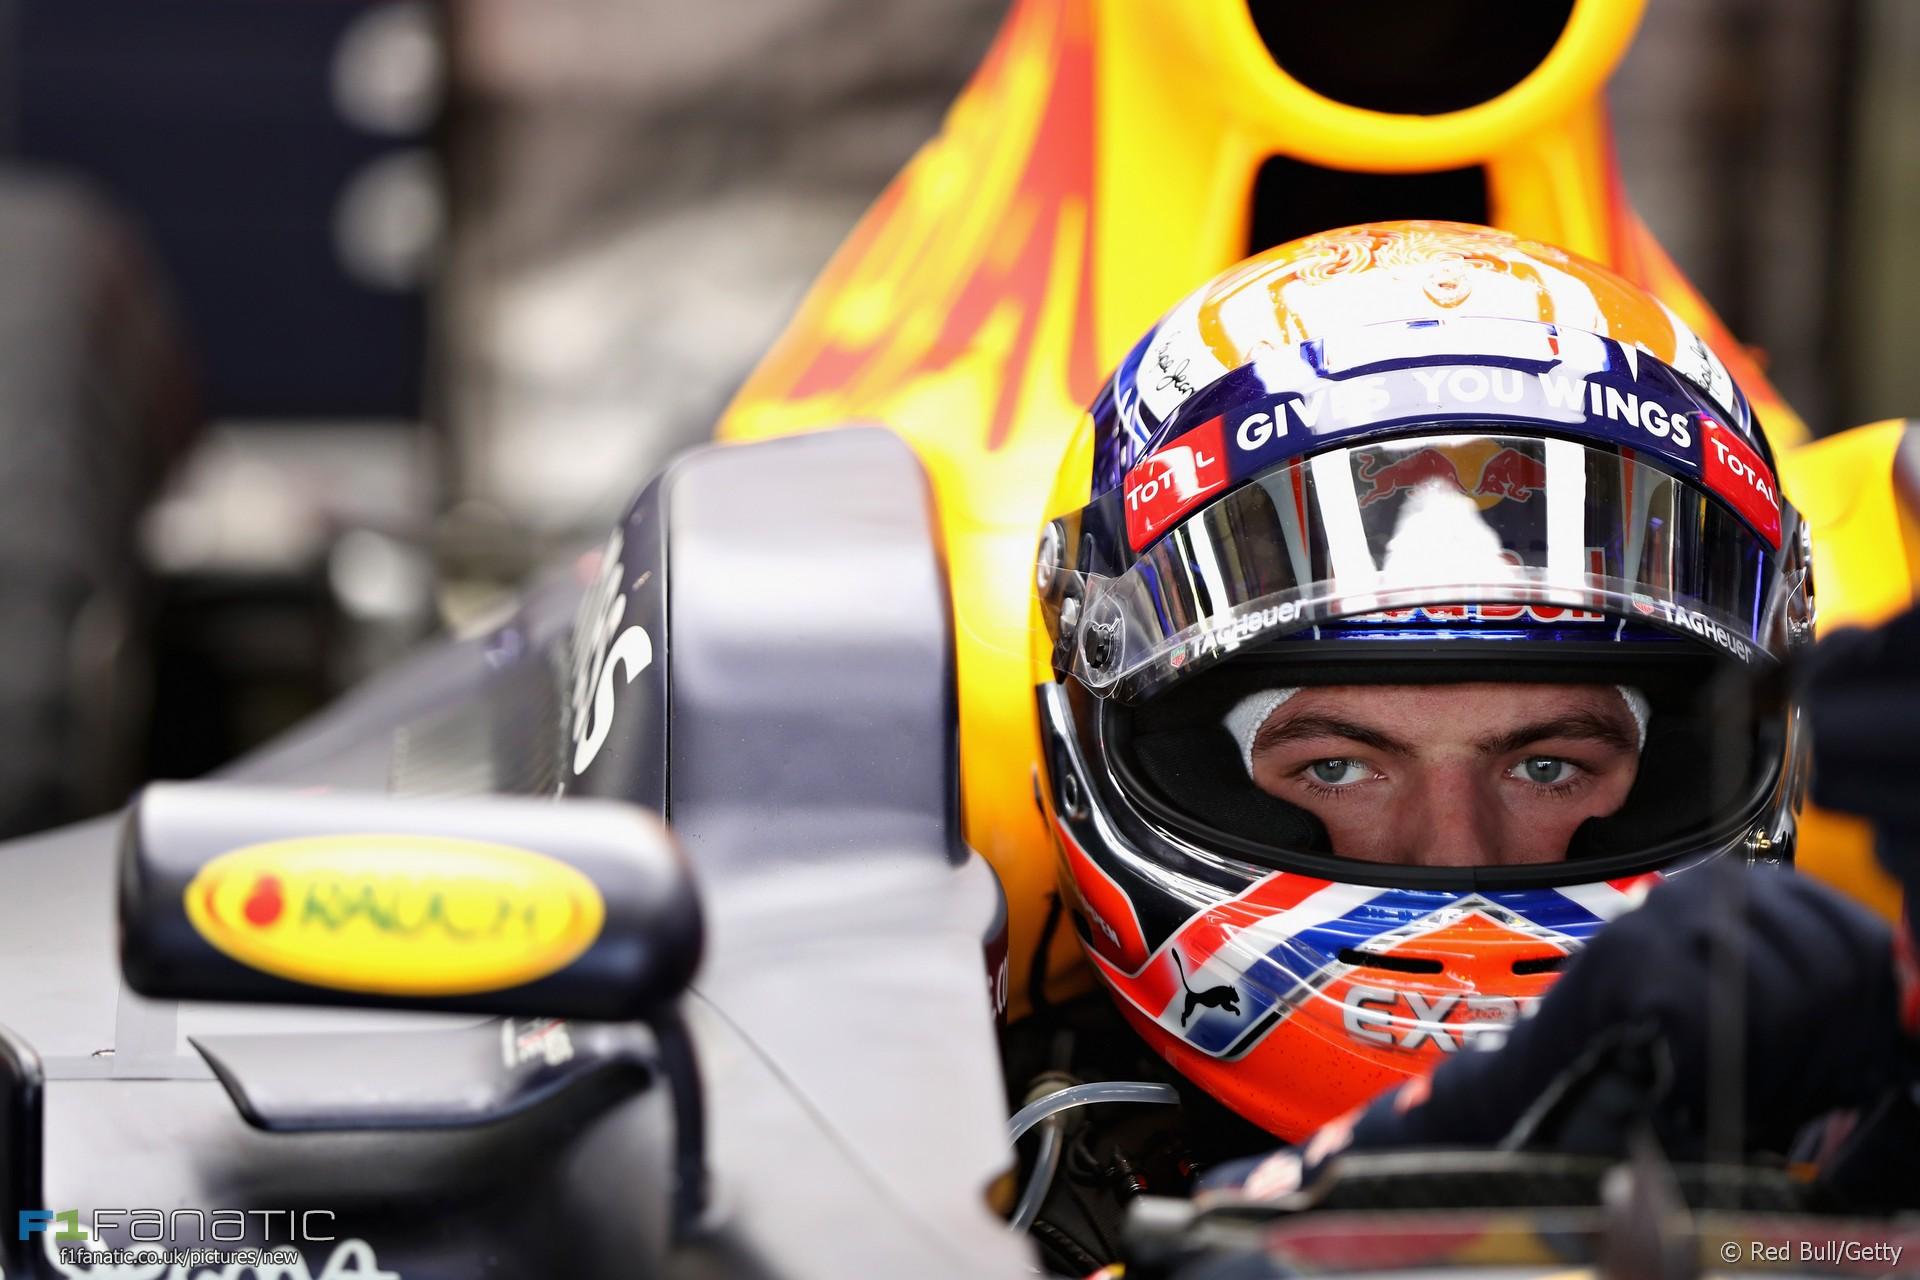 Max Verstappen, Red Bull, Autodromo Hermanos Rodriguez, 2016